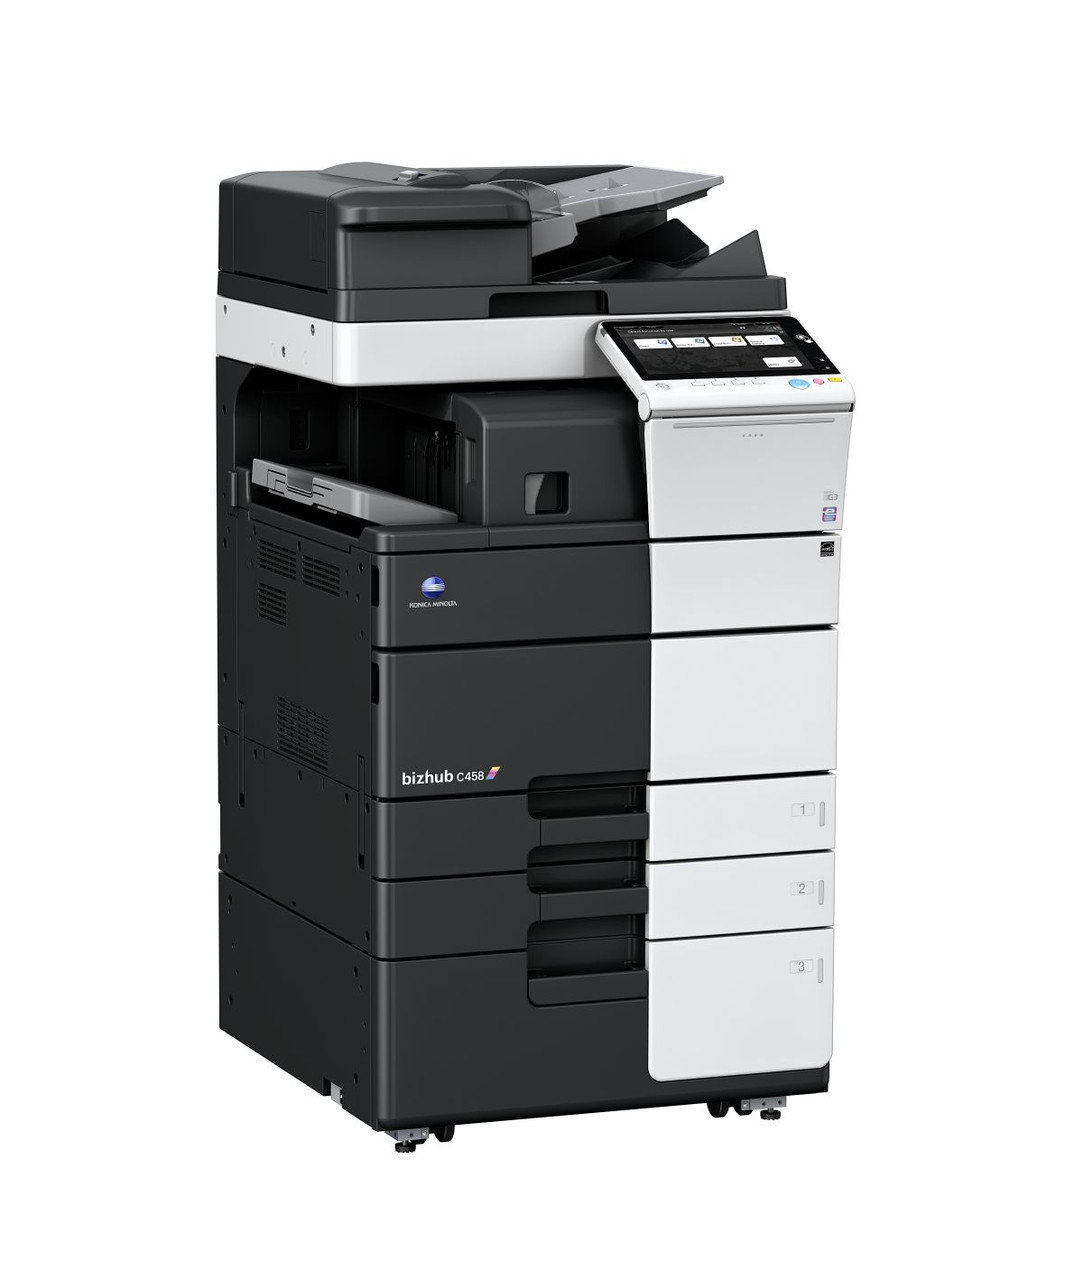 Konica Minolta bizhub C458 (принтер/копир/сканер/факс/СКСМ)